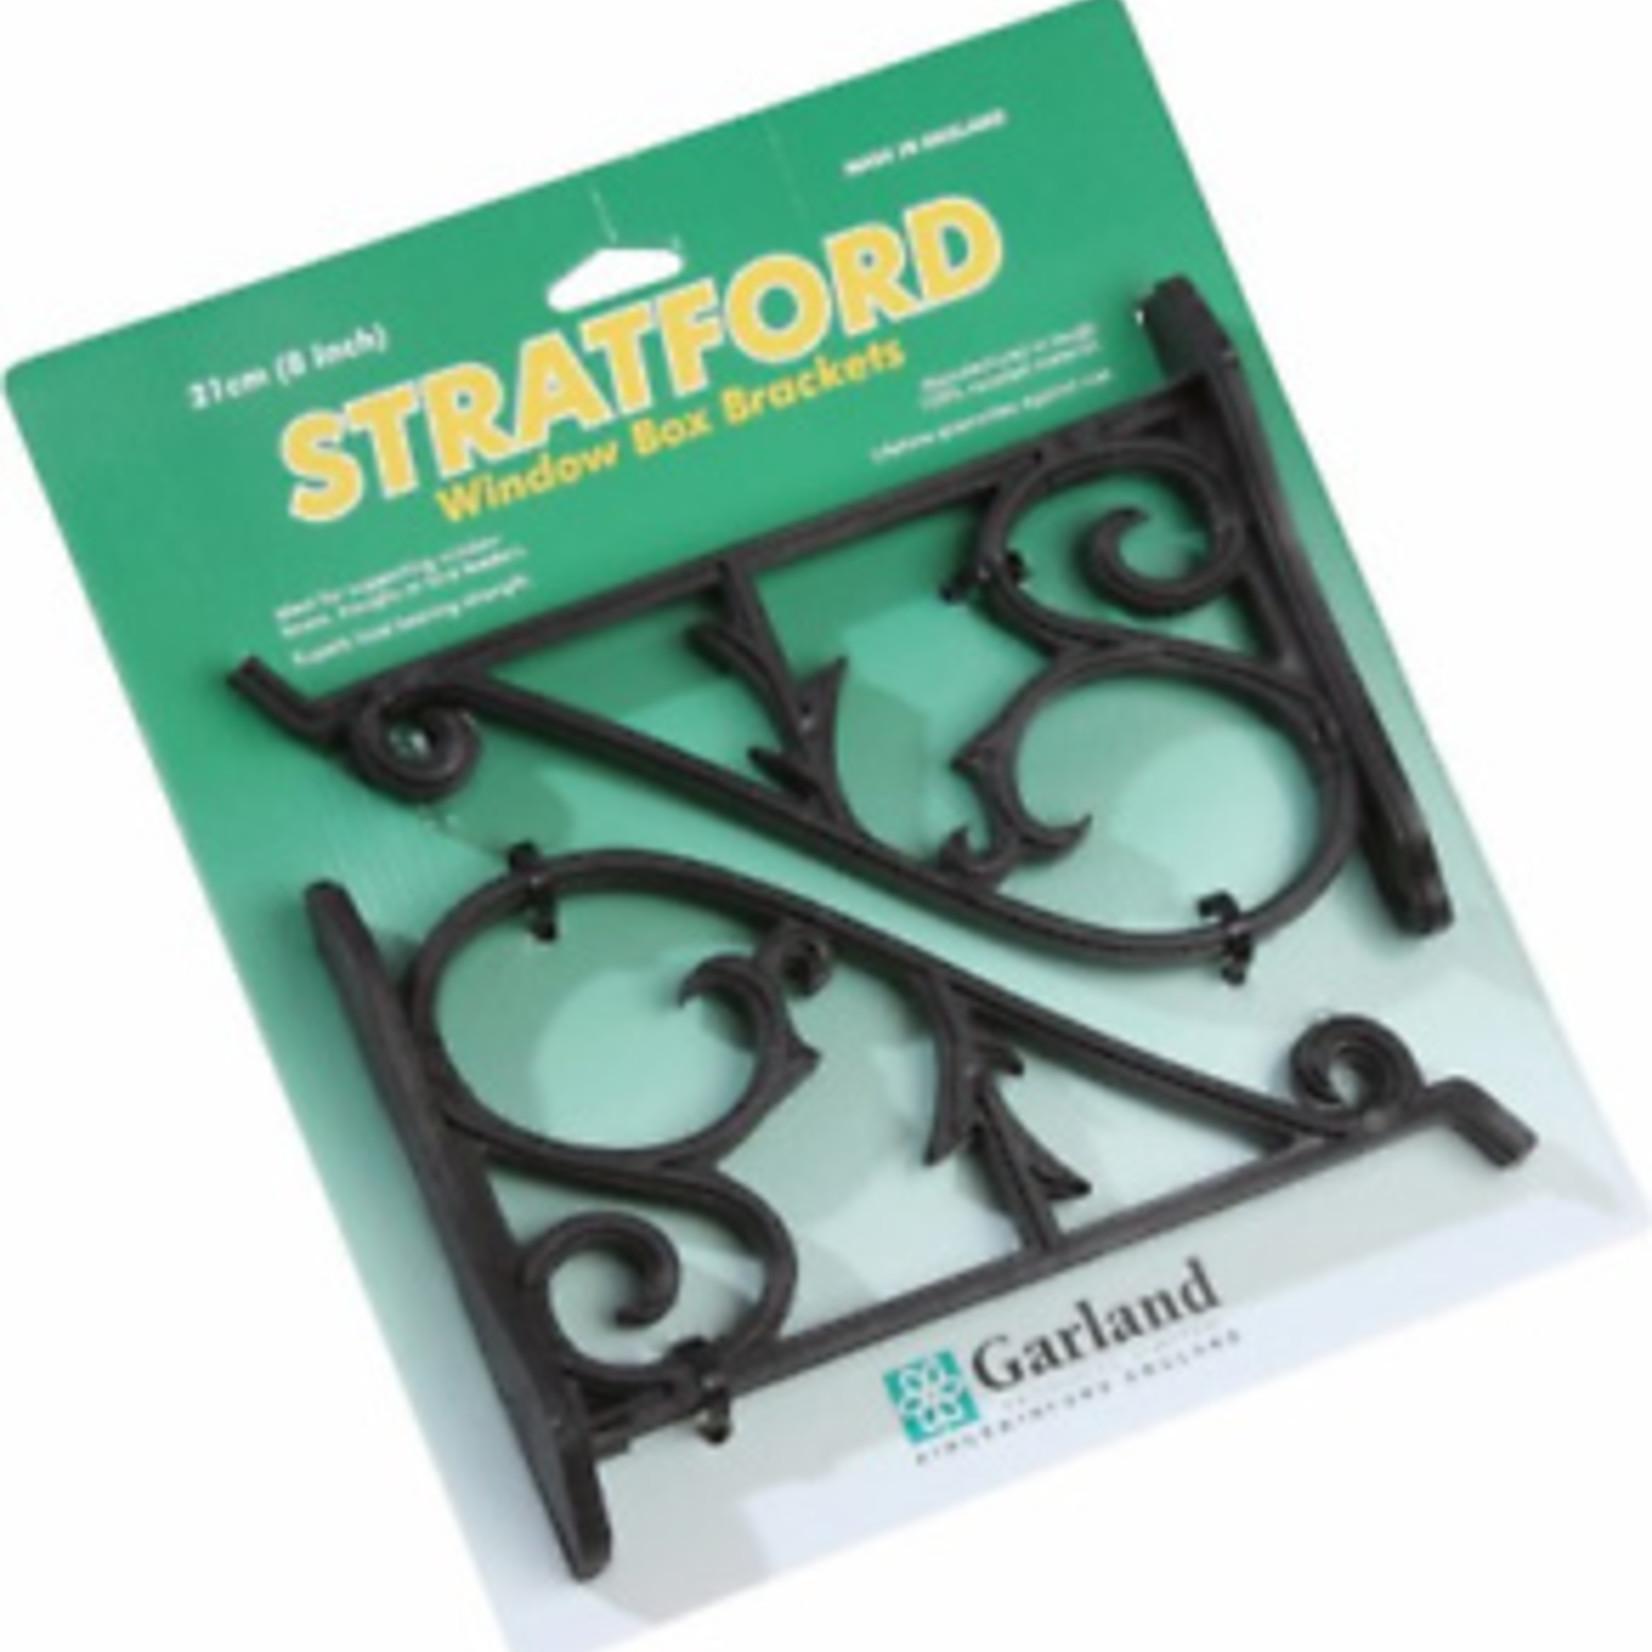 GARLAND STRATFORD SUPPORT BRACKETS (SOLD IN PAIRS)